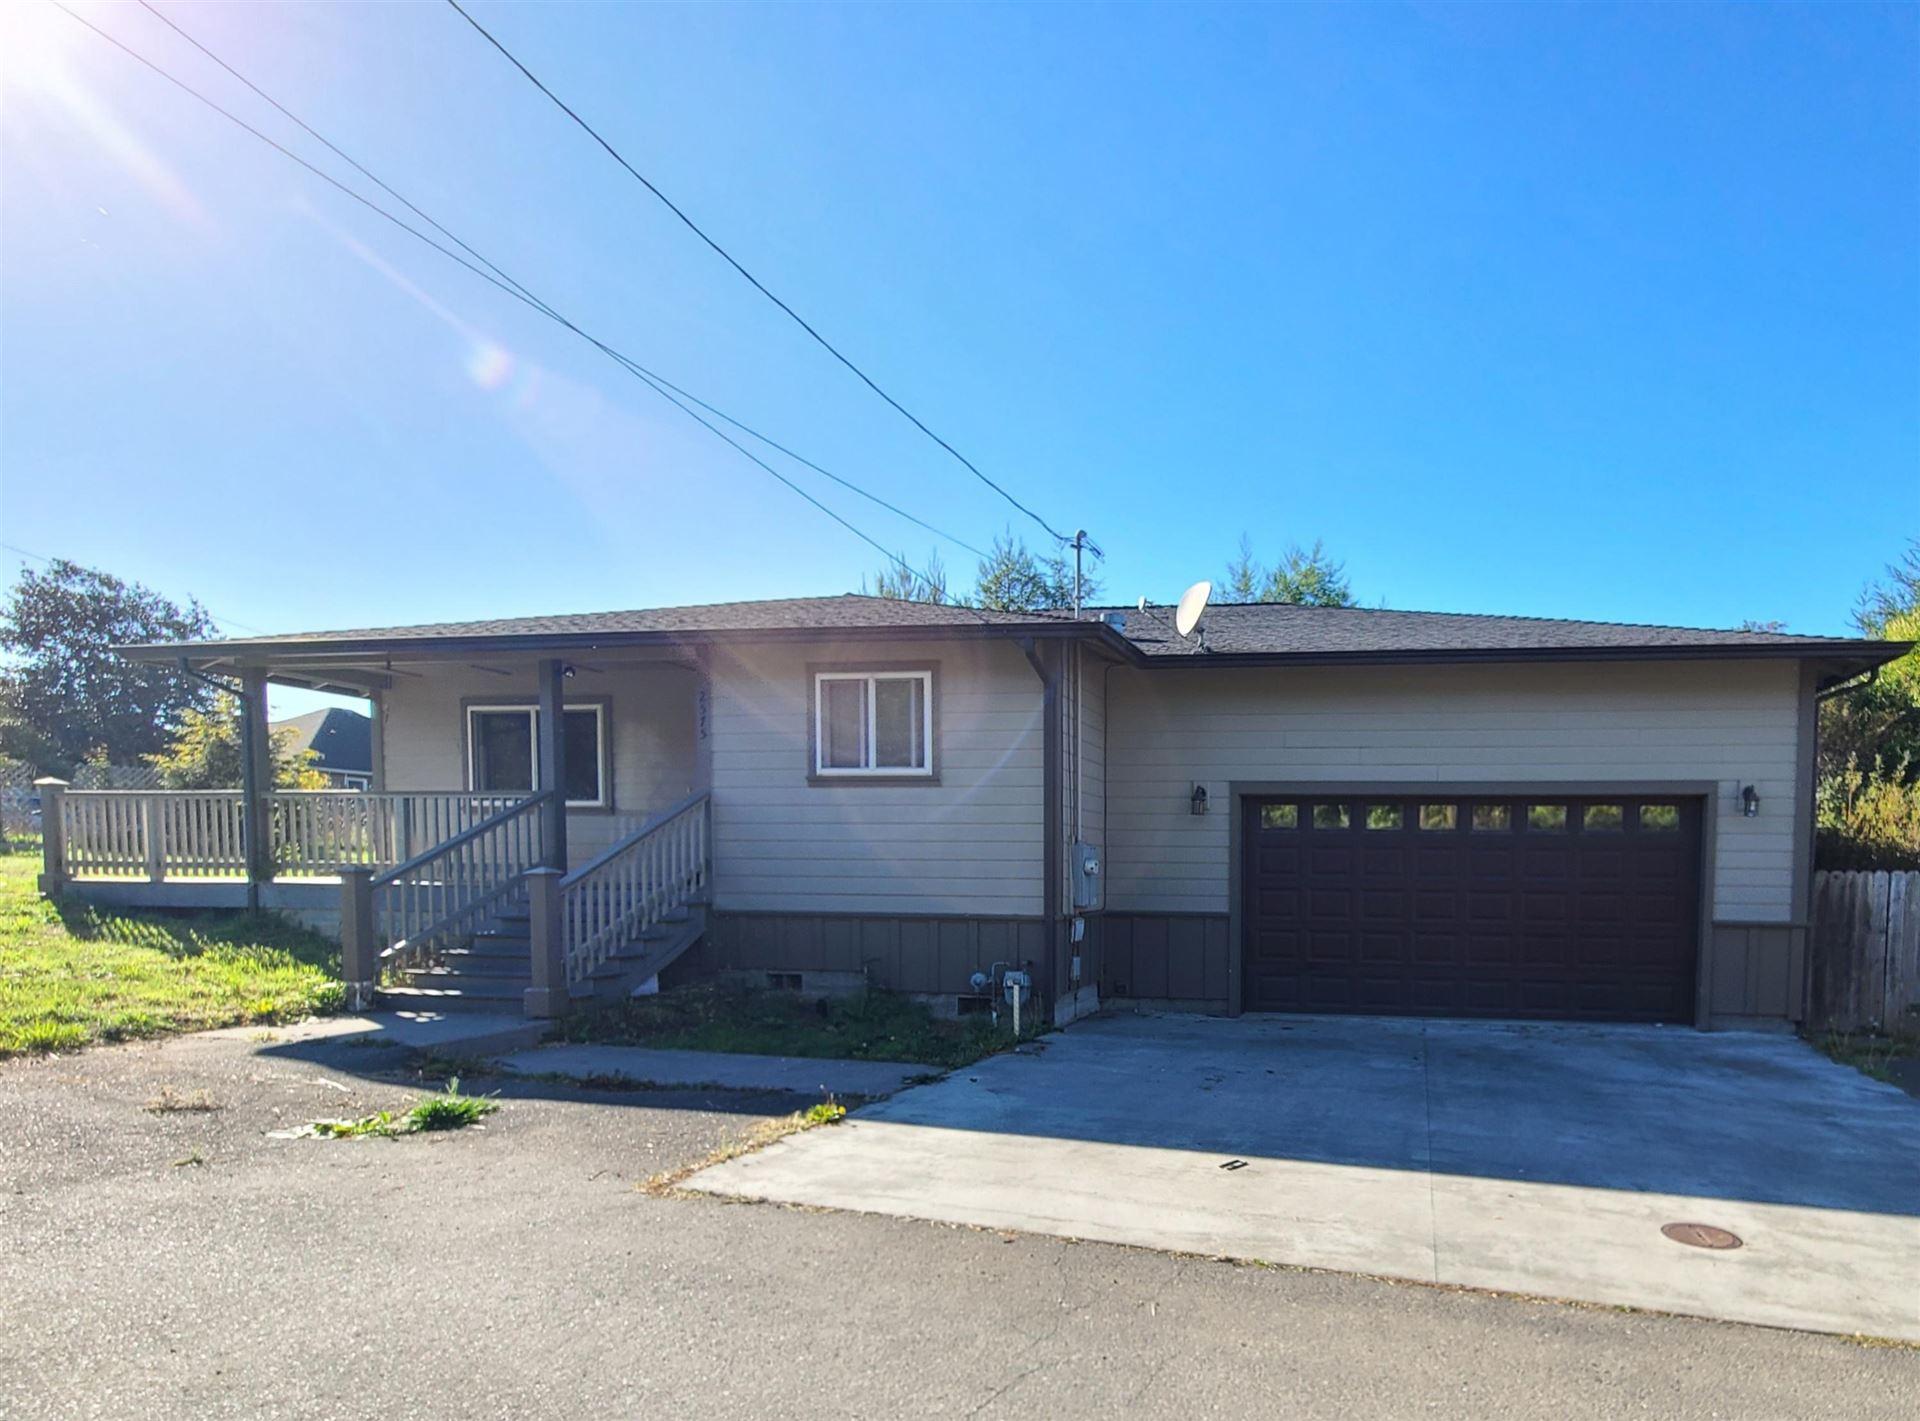 2575 Todd Court, Arcata, CA 95521 - MLS#: 257634